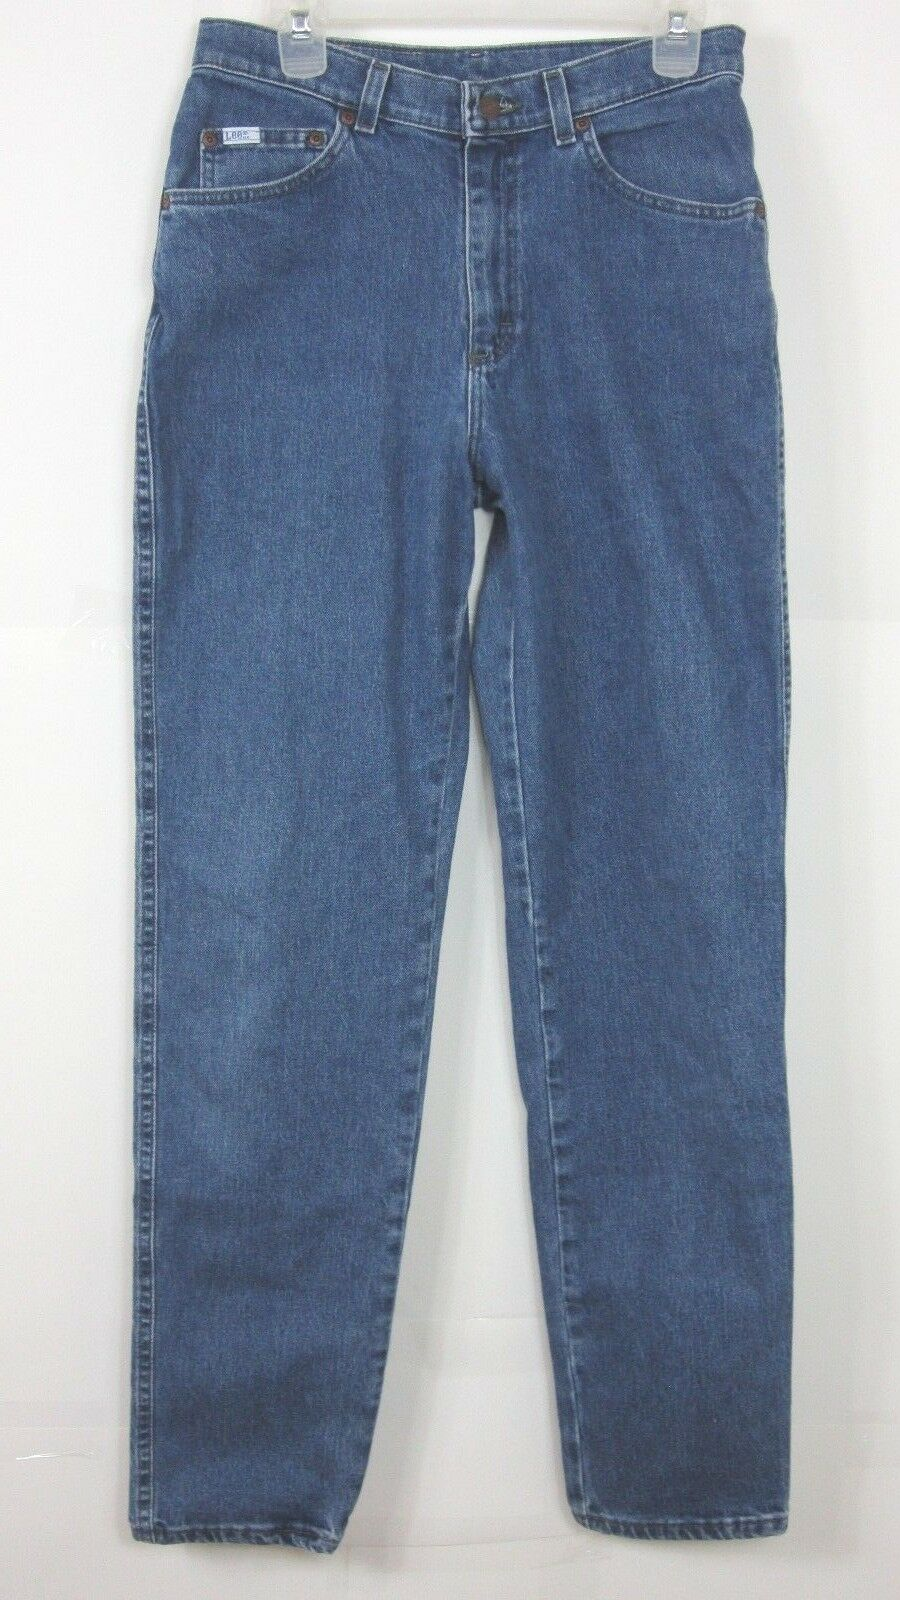 Vintage Lee  High Waist bluee Denim Mom Jeans Womens Size 12 L  ( 29x33 )